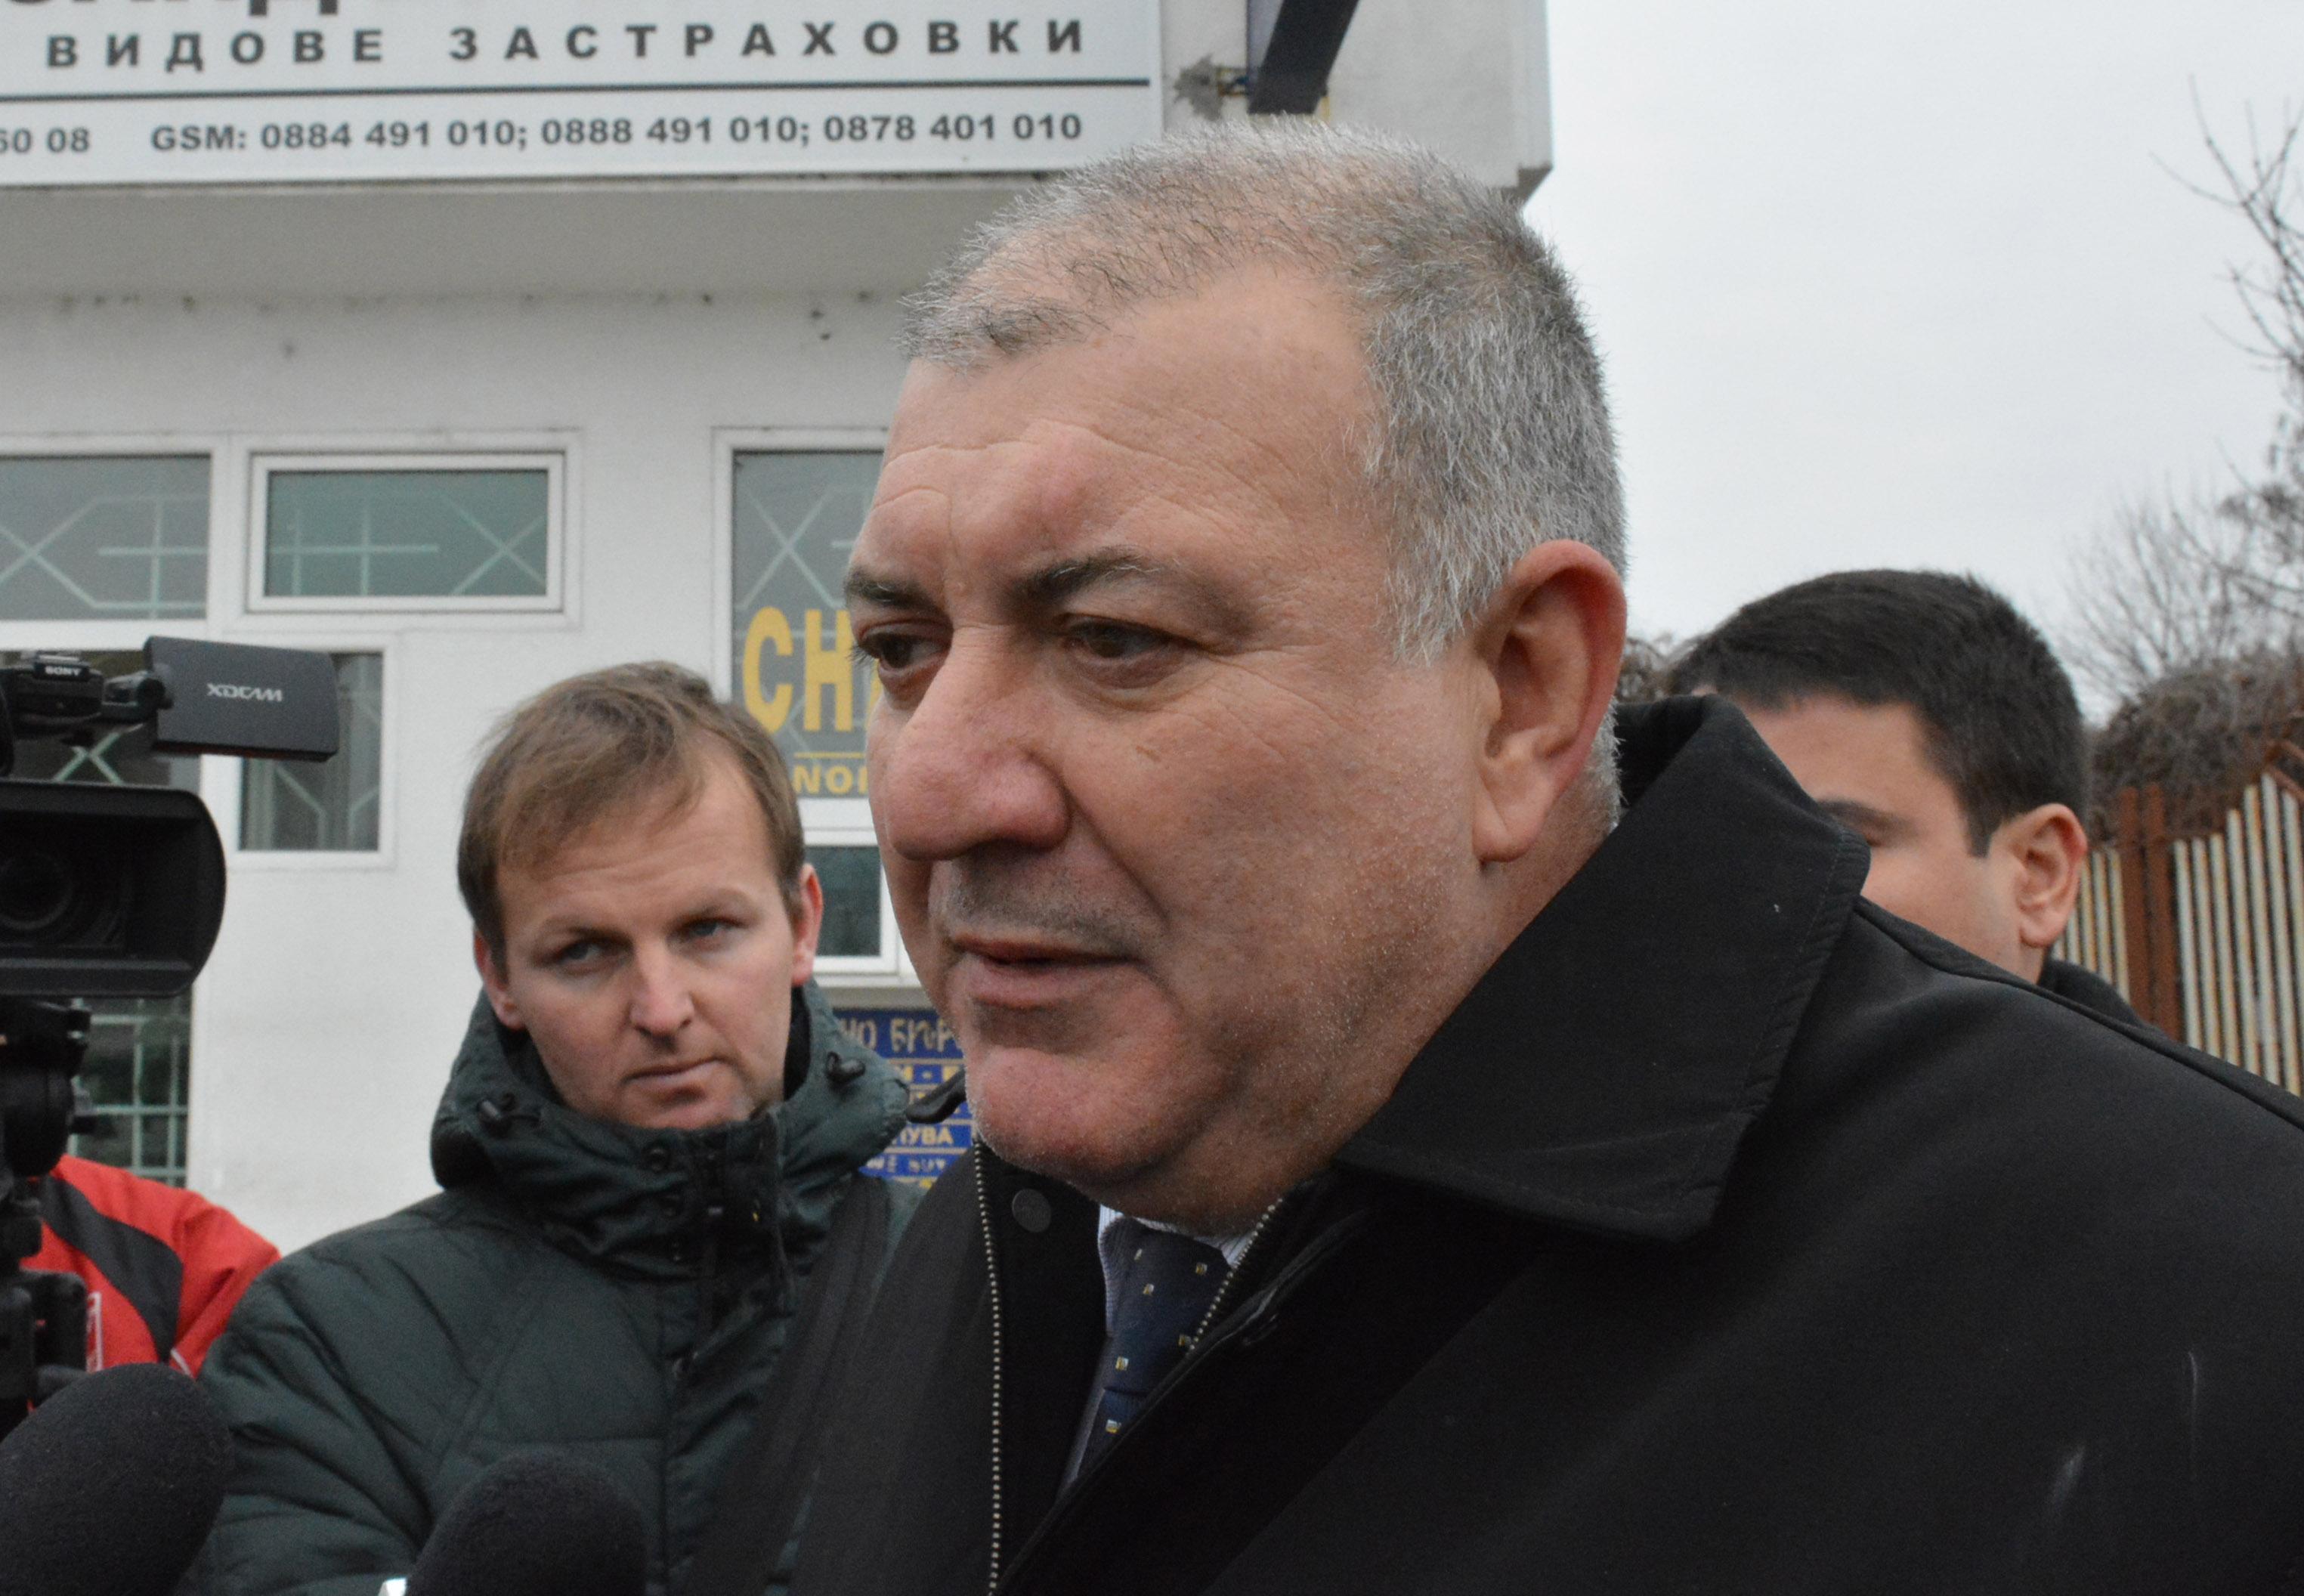 Георги Костов: Борим контрабандата все по-успешно